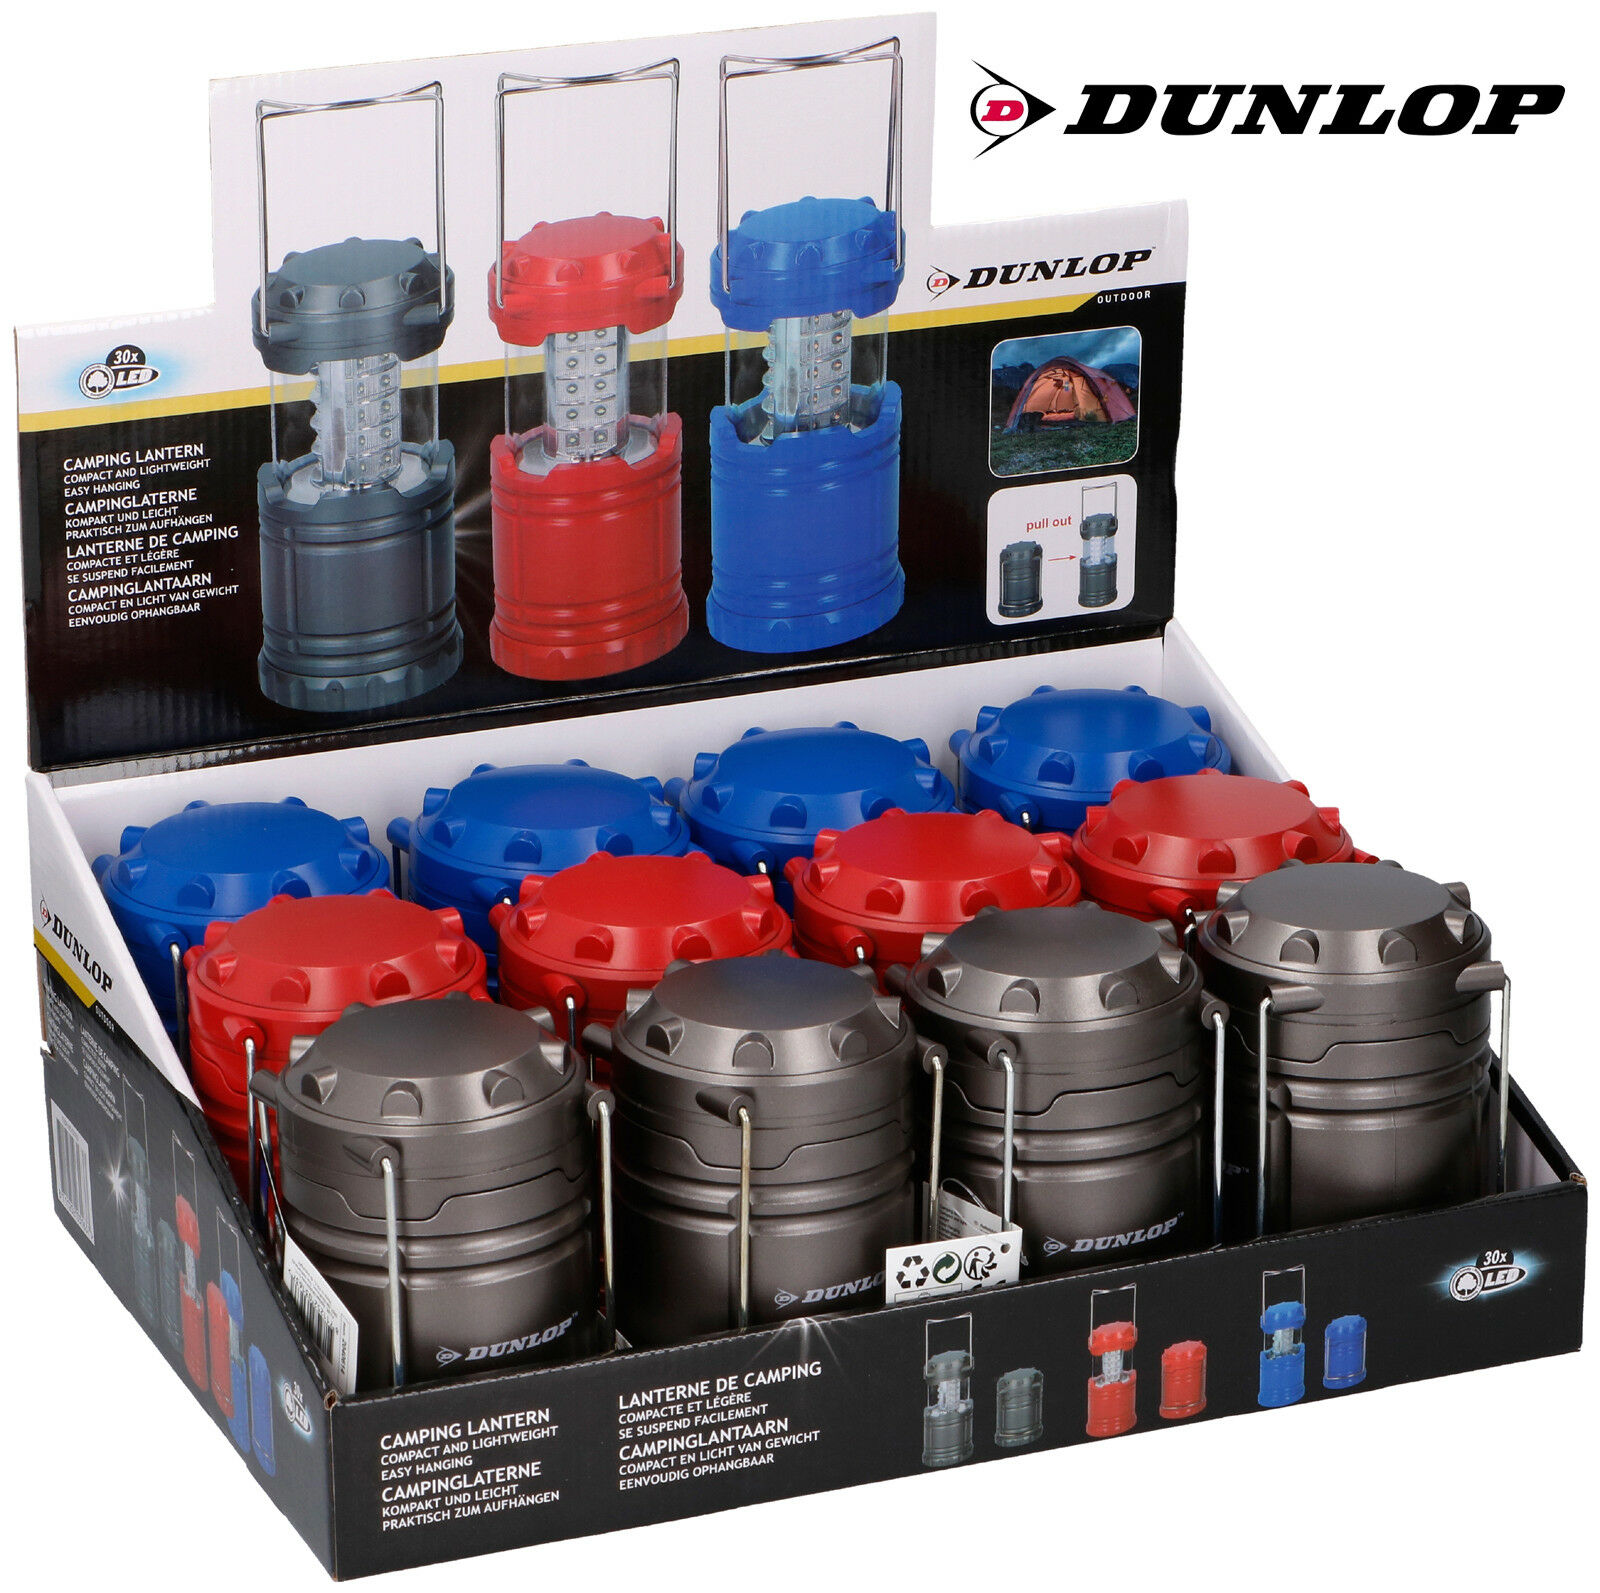 Dunlop Dunlop Dunlop extractible Camping Lampe Lanterne 30 DEL Lampe zeltlampe Outdoor Luminaire cde828